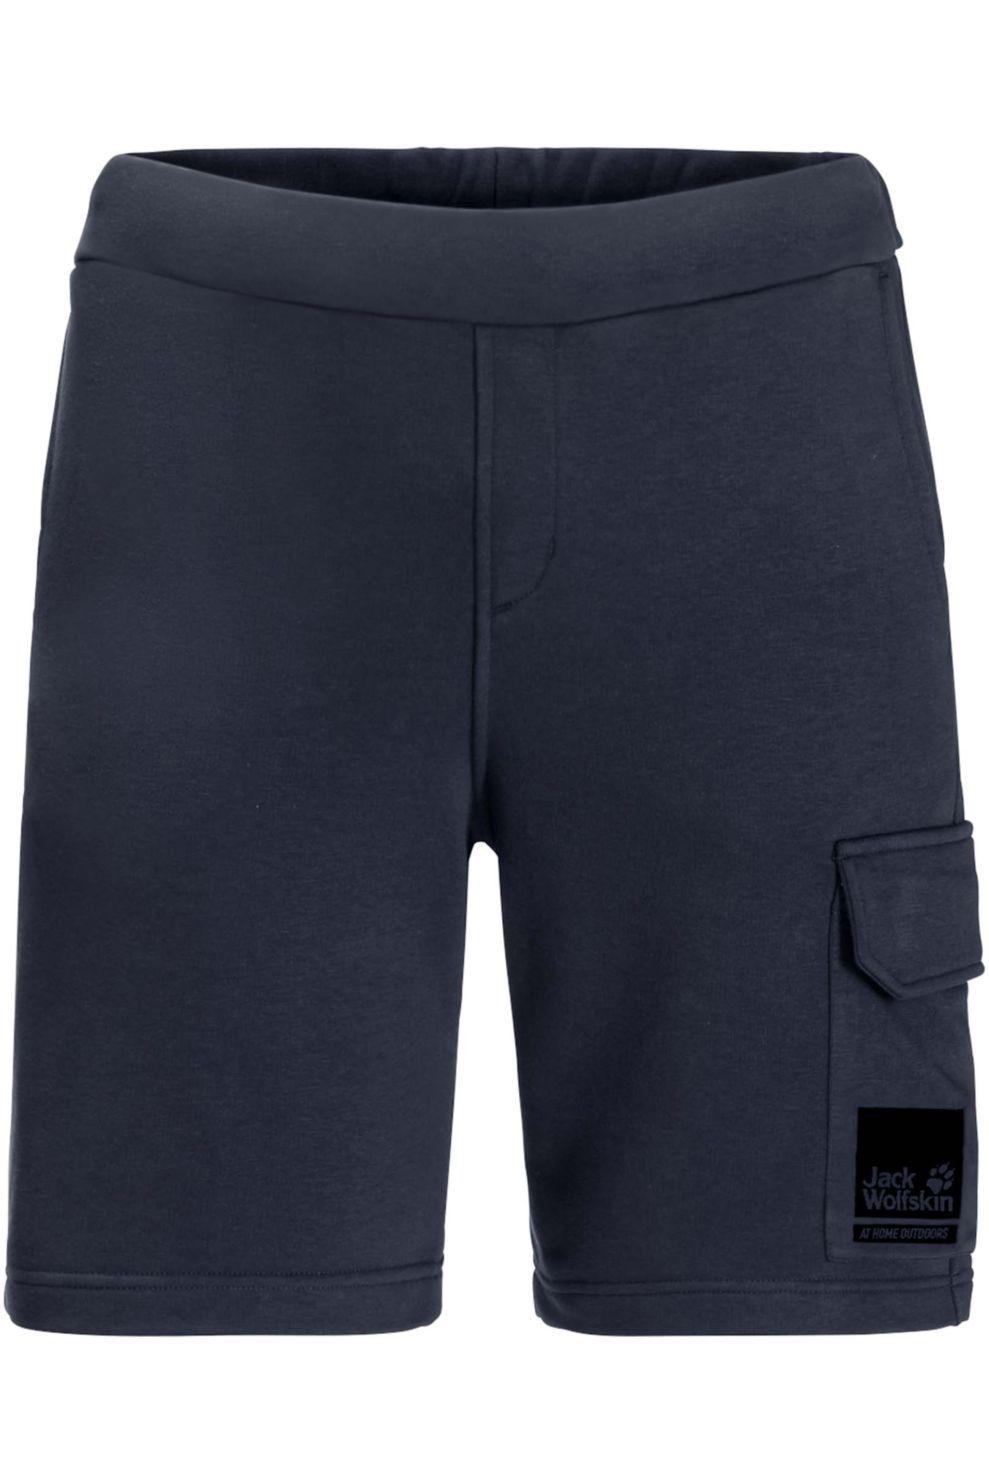 Jack Wolfskin Short 365 Thunder voor heren - Blauw - Maten: S, M, L, XL, XXL, XXXL